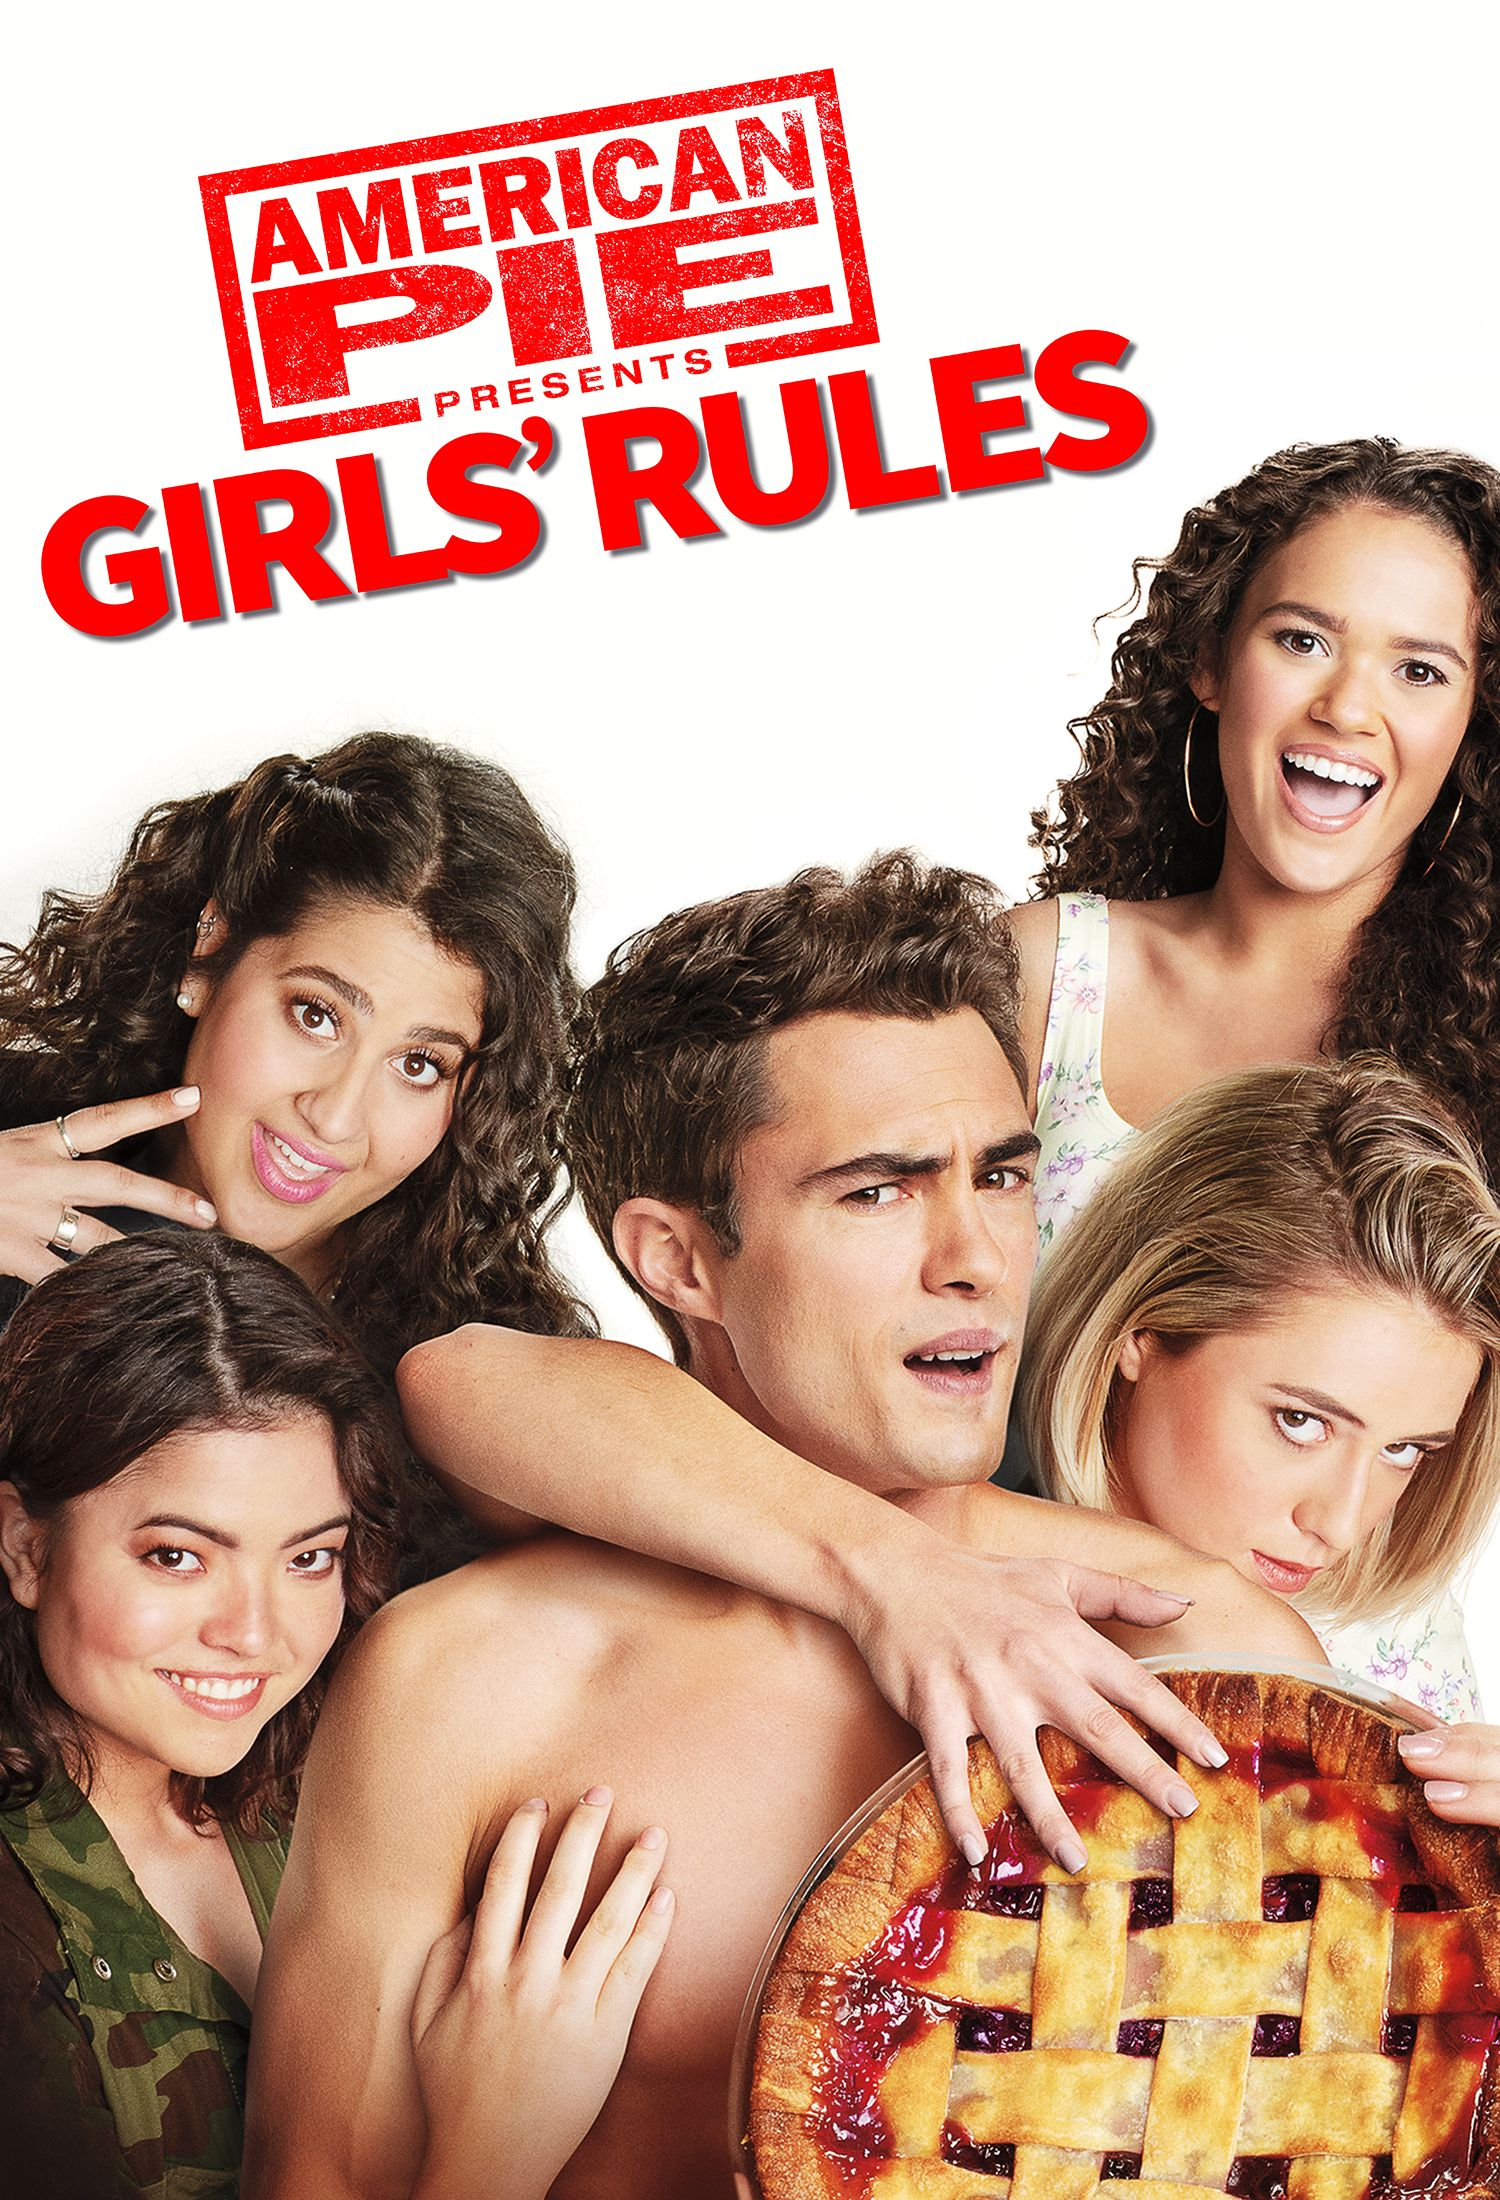 Nonton Film American Pie Presents Girls Rules 2020 Subtitle Indonesia Film Sekolah Menengah Film Baru